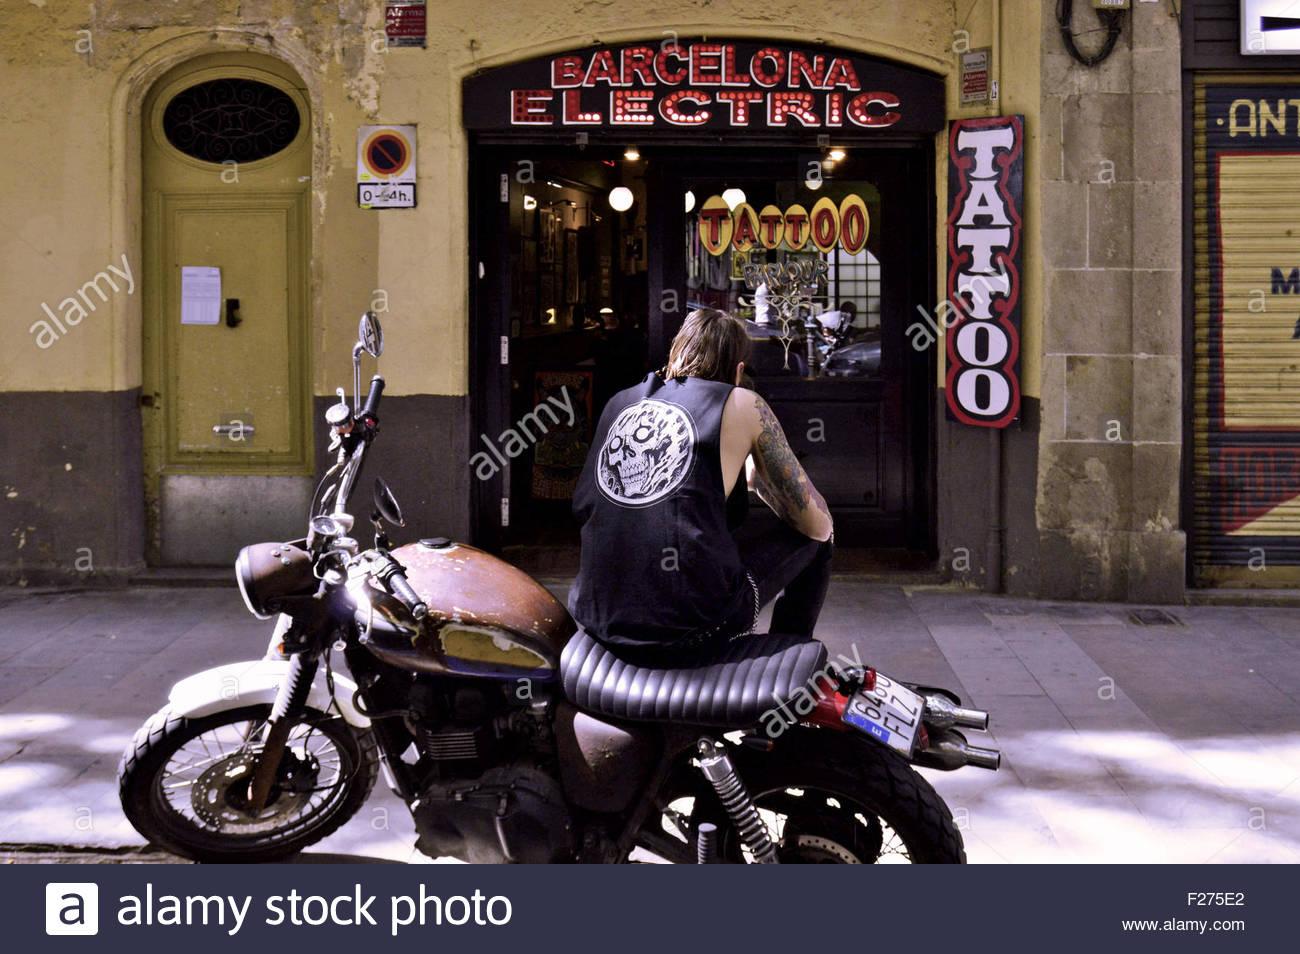 Motorcycle with biker tattoo - Man Biker Sitting On Motorcycle Outside Tattoo Parlour In Ciutat Vella Barcelona Catalonia Spain Europe